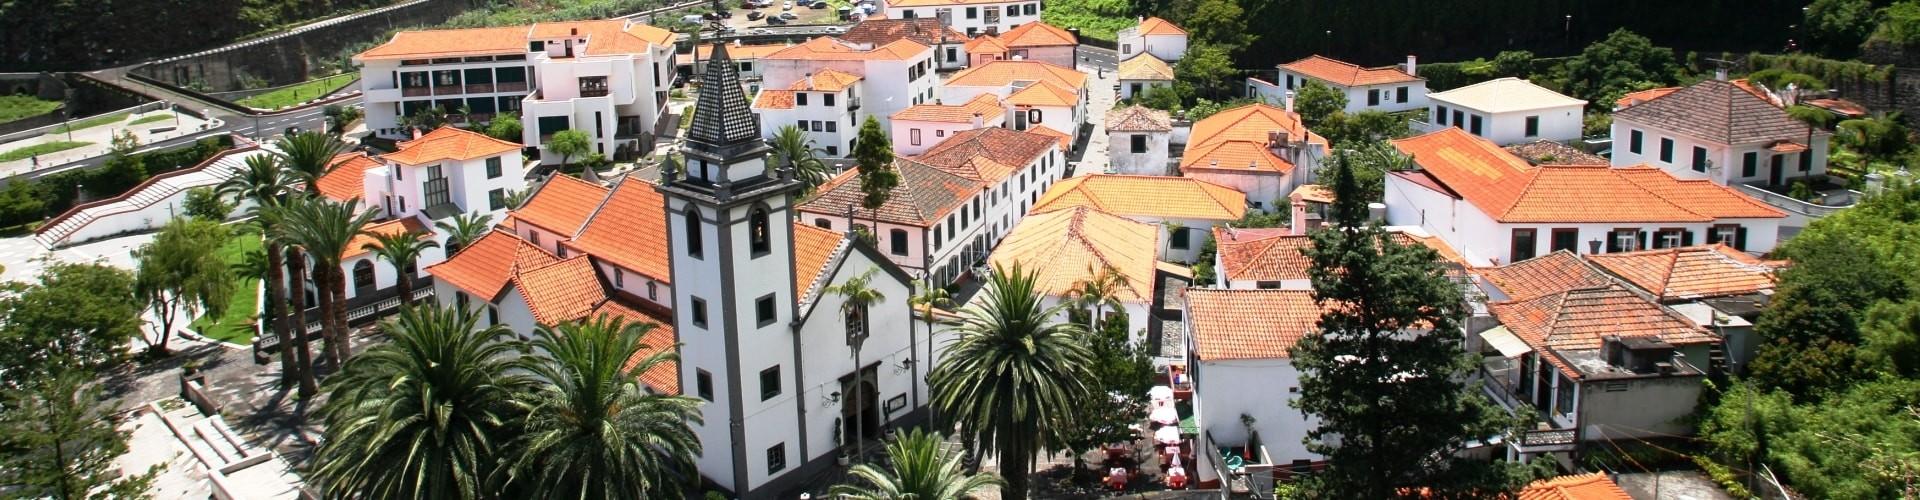 São Vicente Municipality in Madeira Island